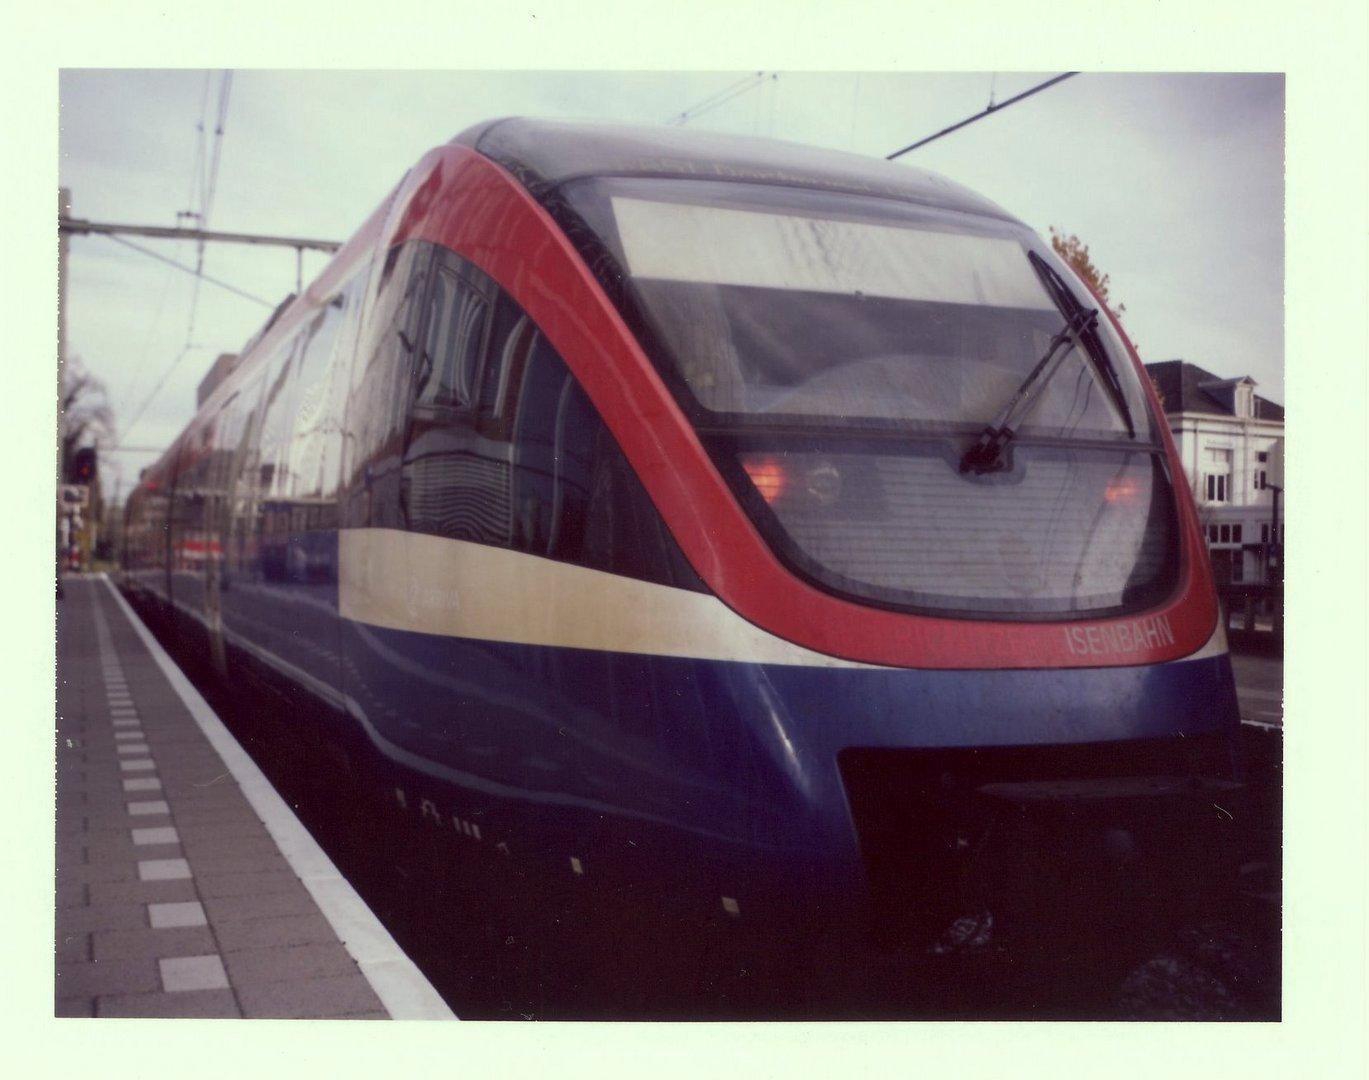 Westmünsterlandbahn Dortmund>Enschede v/v